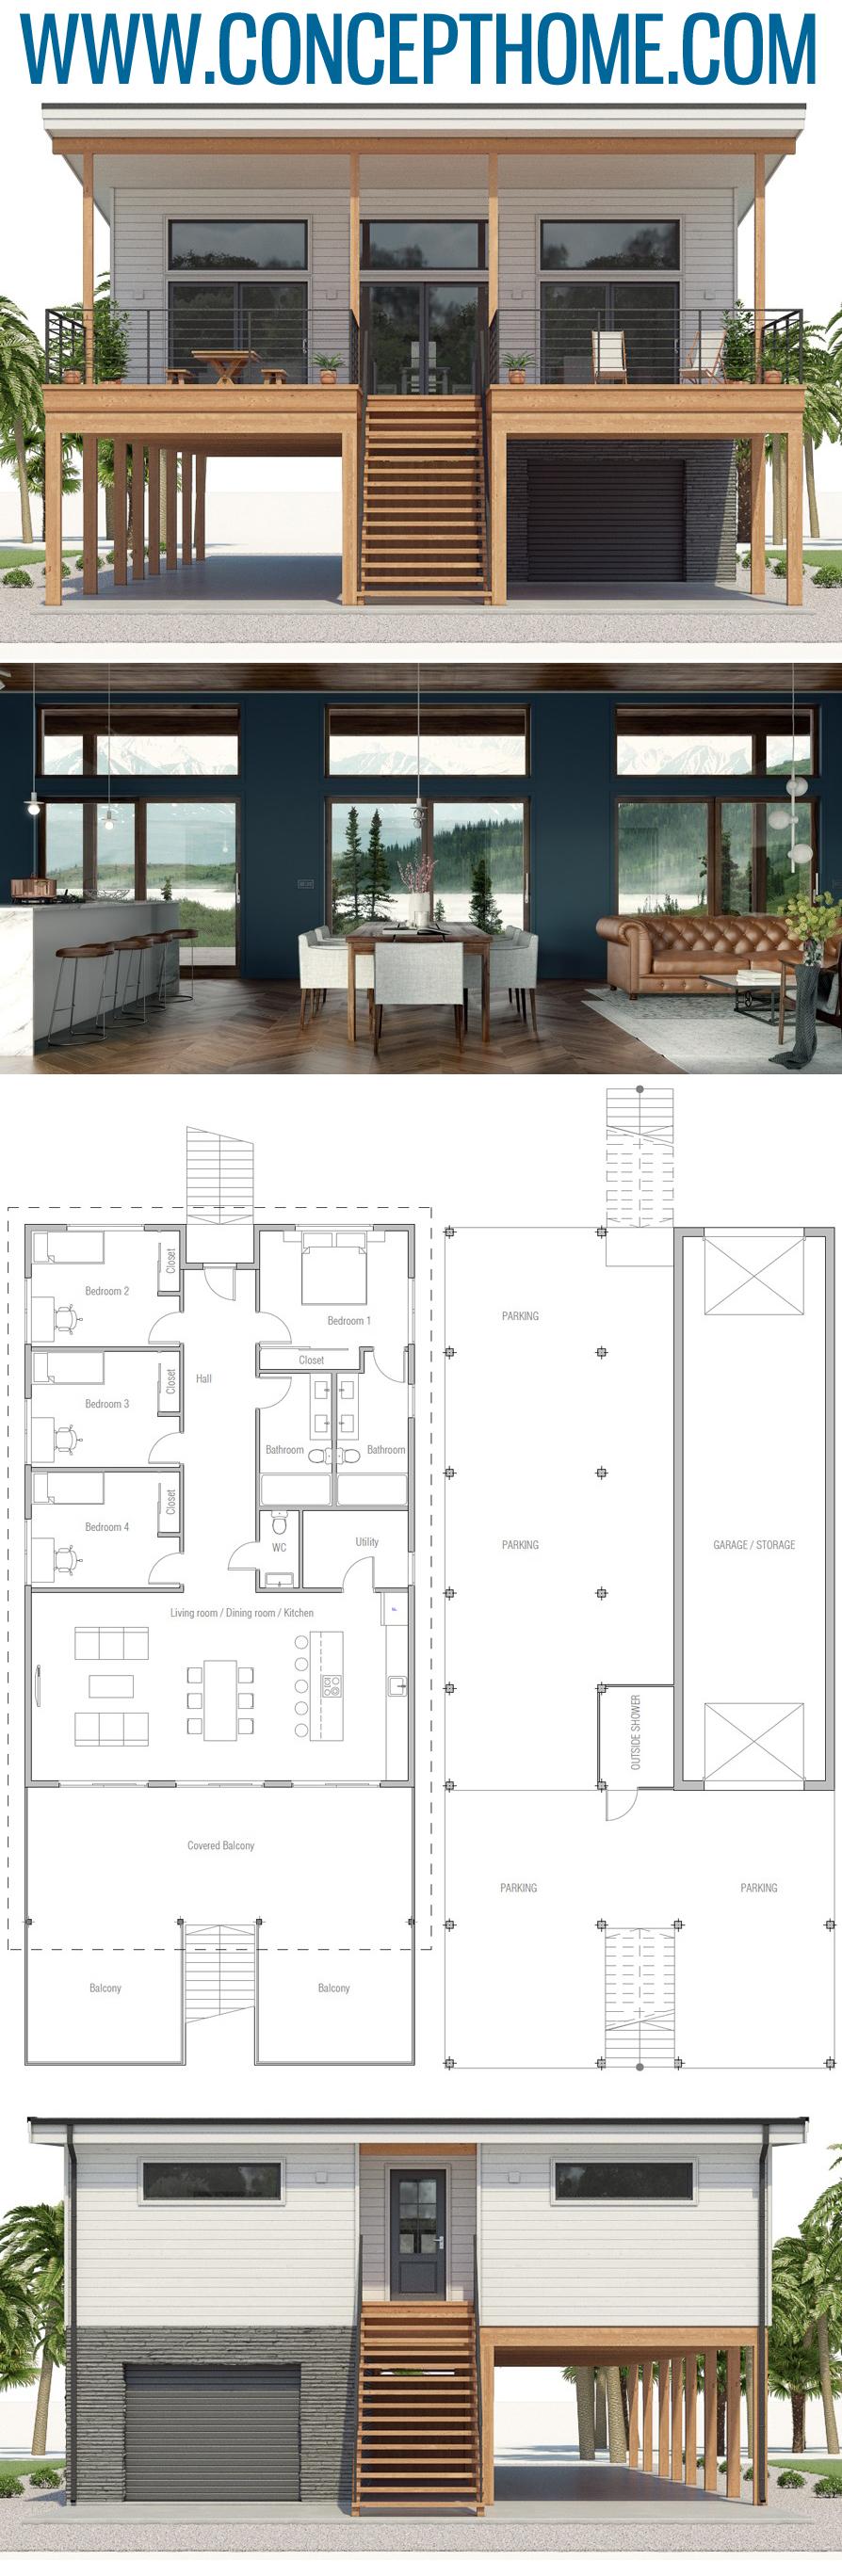 House Plan CH536 #strandhuis